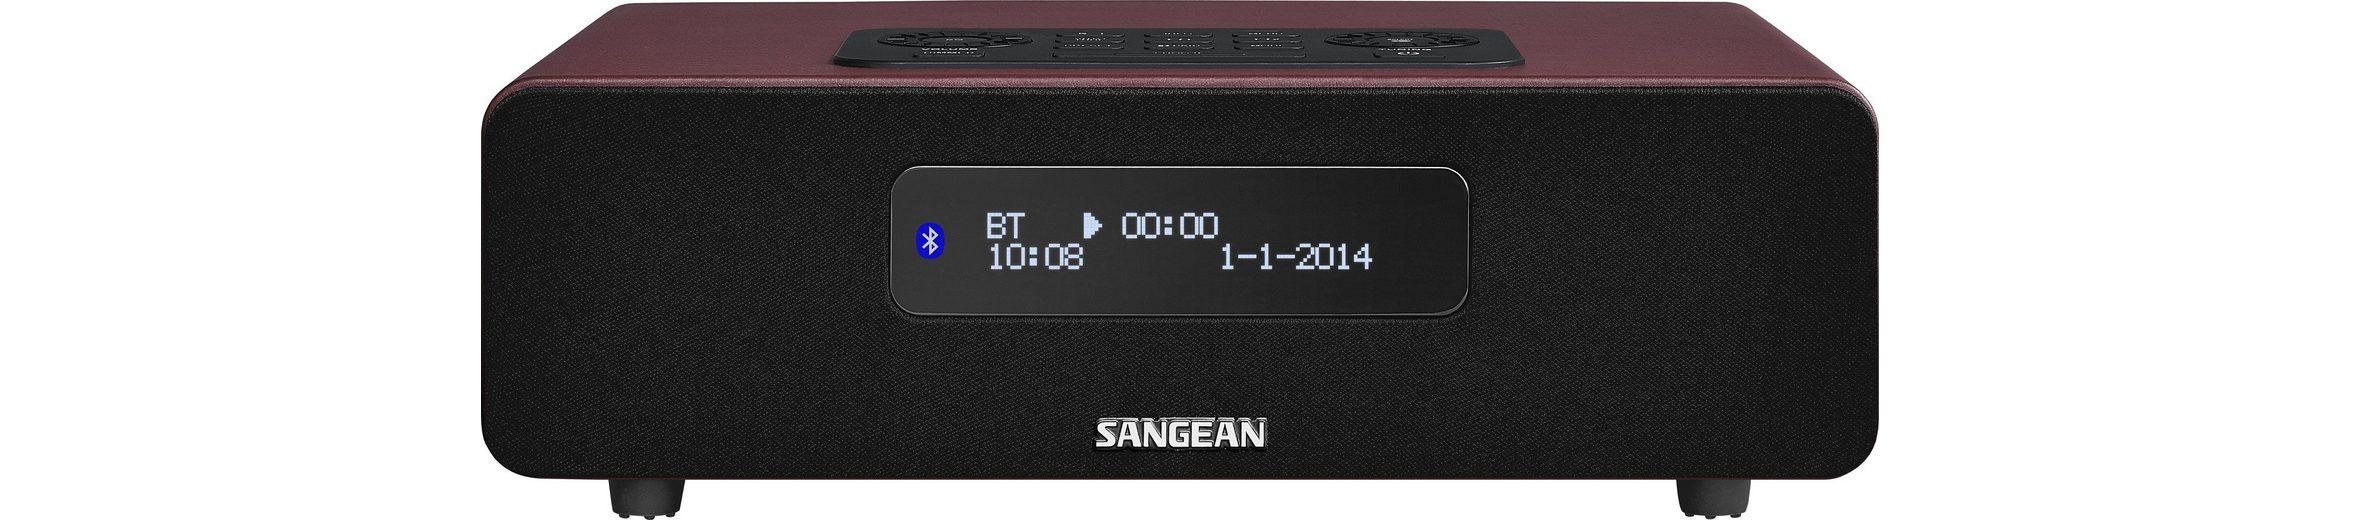 Sangean digitales Tischradio (DAB+/UKW, Bluetooth, Dual-Alarm, AUX-In) »DDR-36 rot«